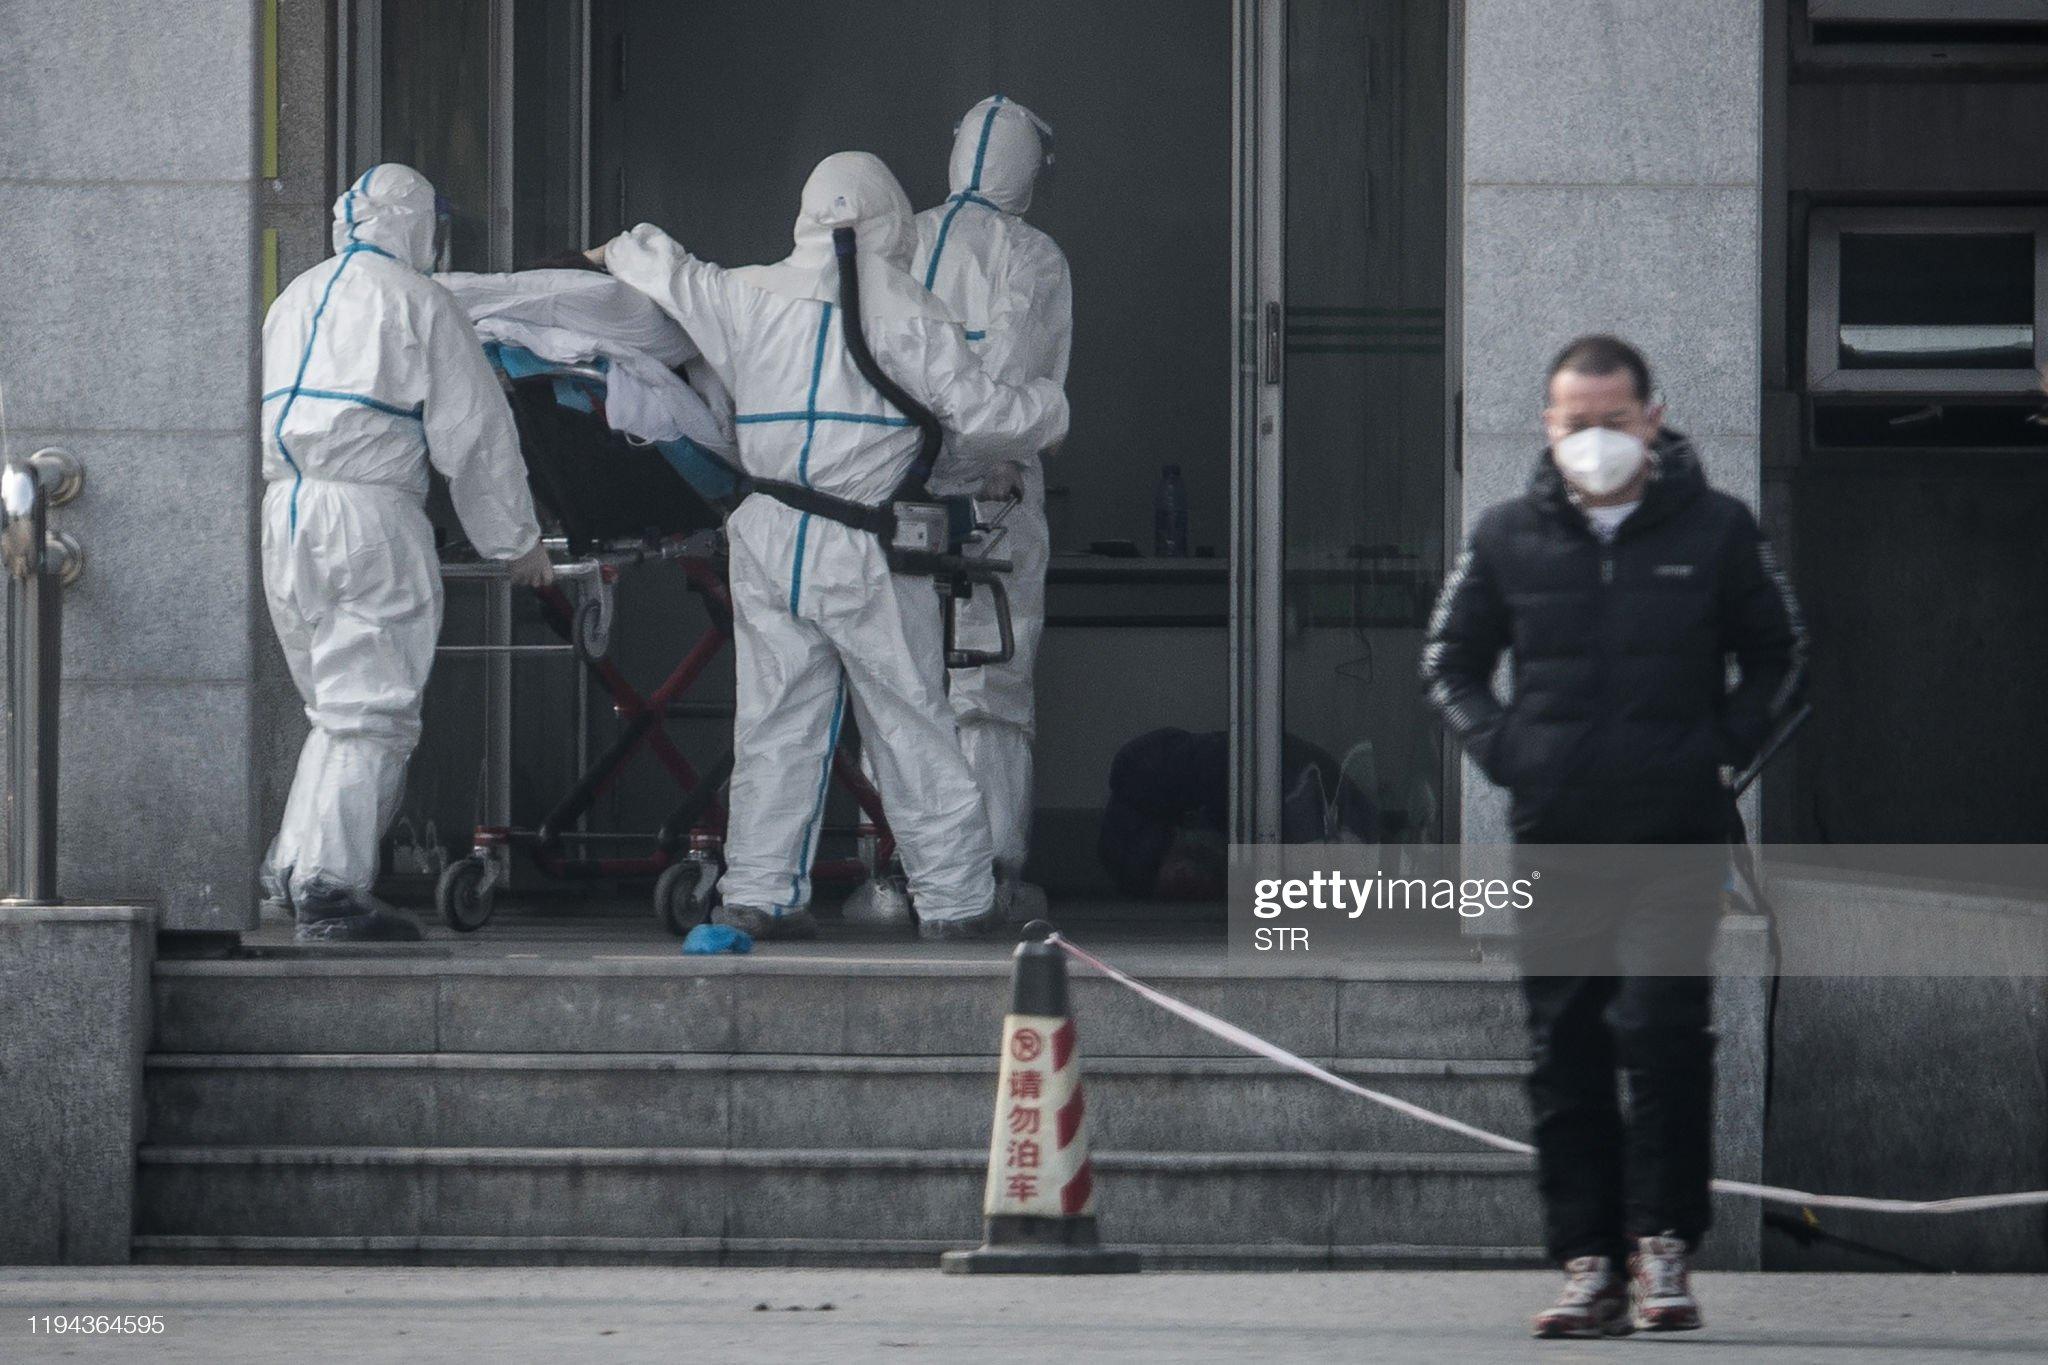 TOPSHOT-CHINA-VIRUS-HEALTH : ニュース写真